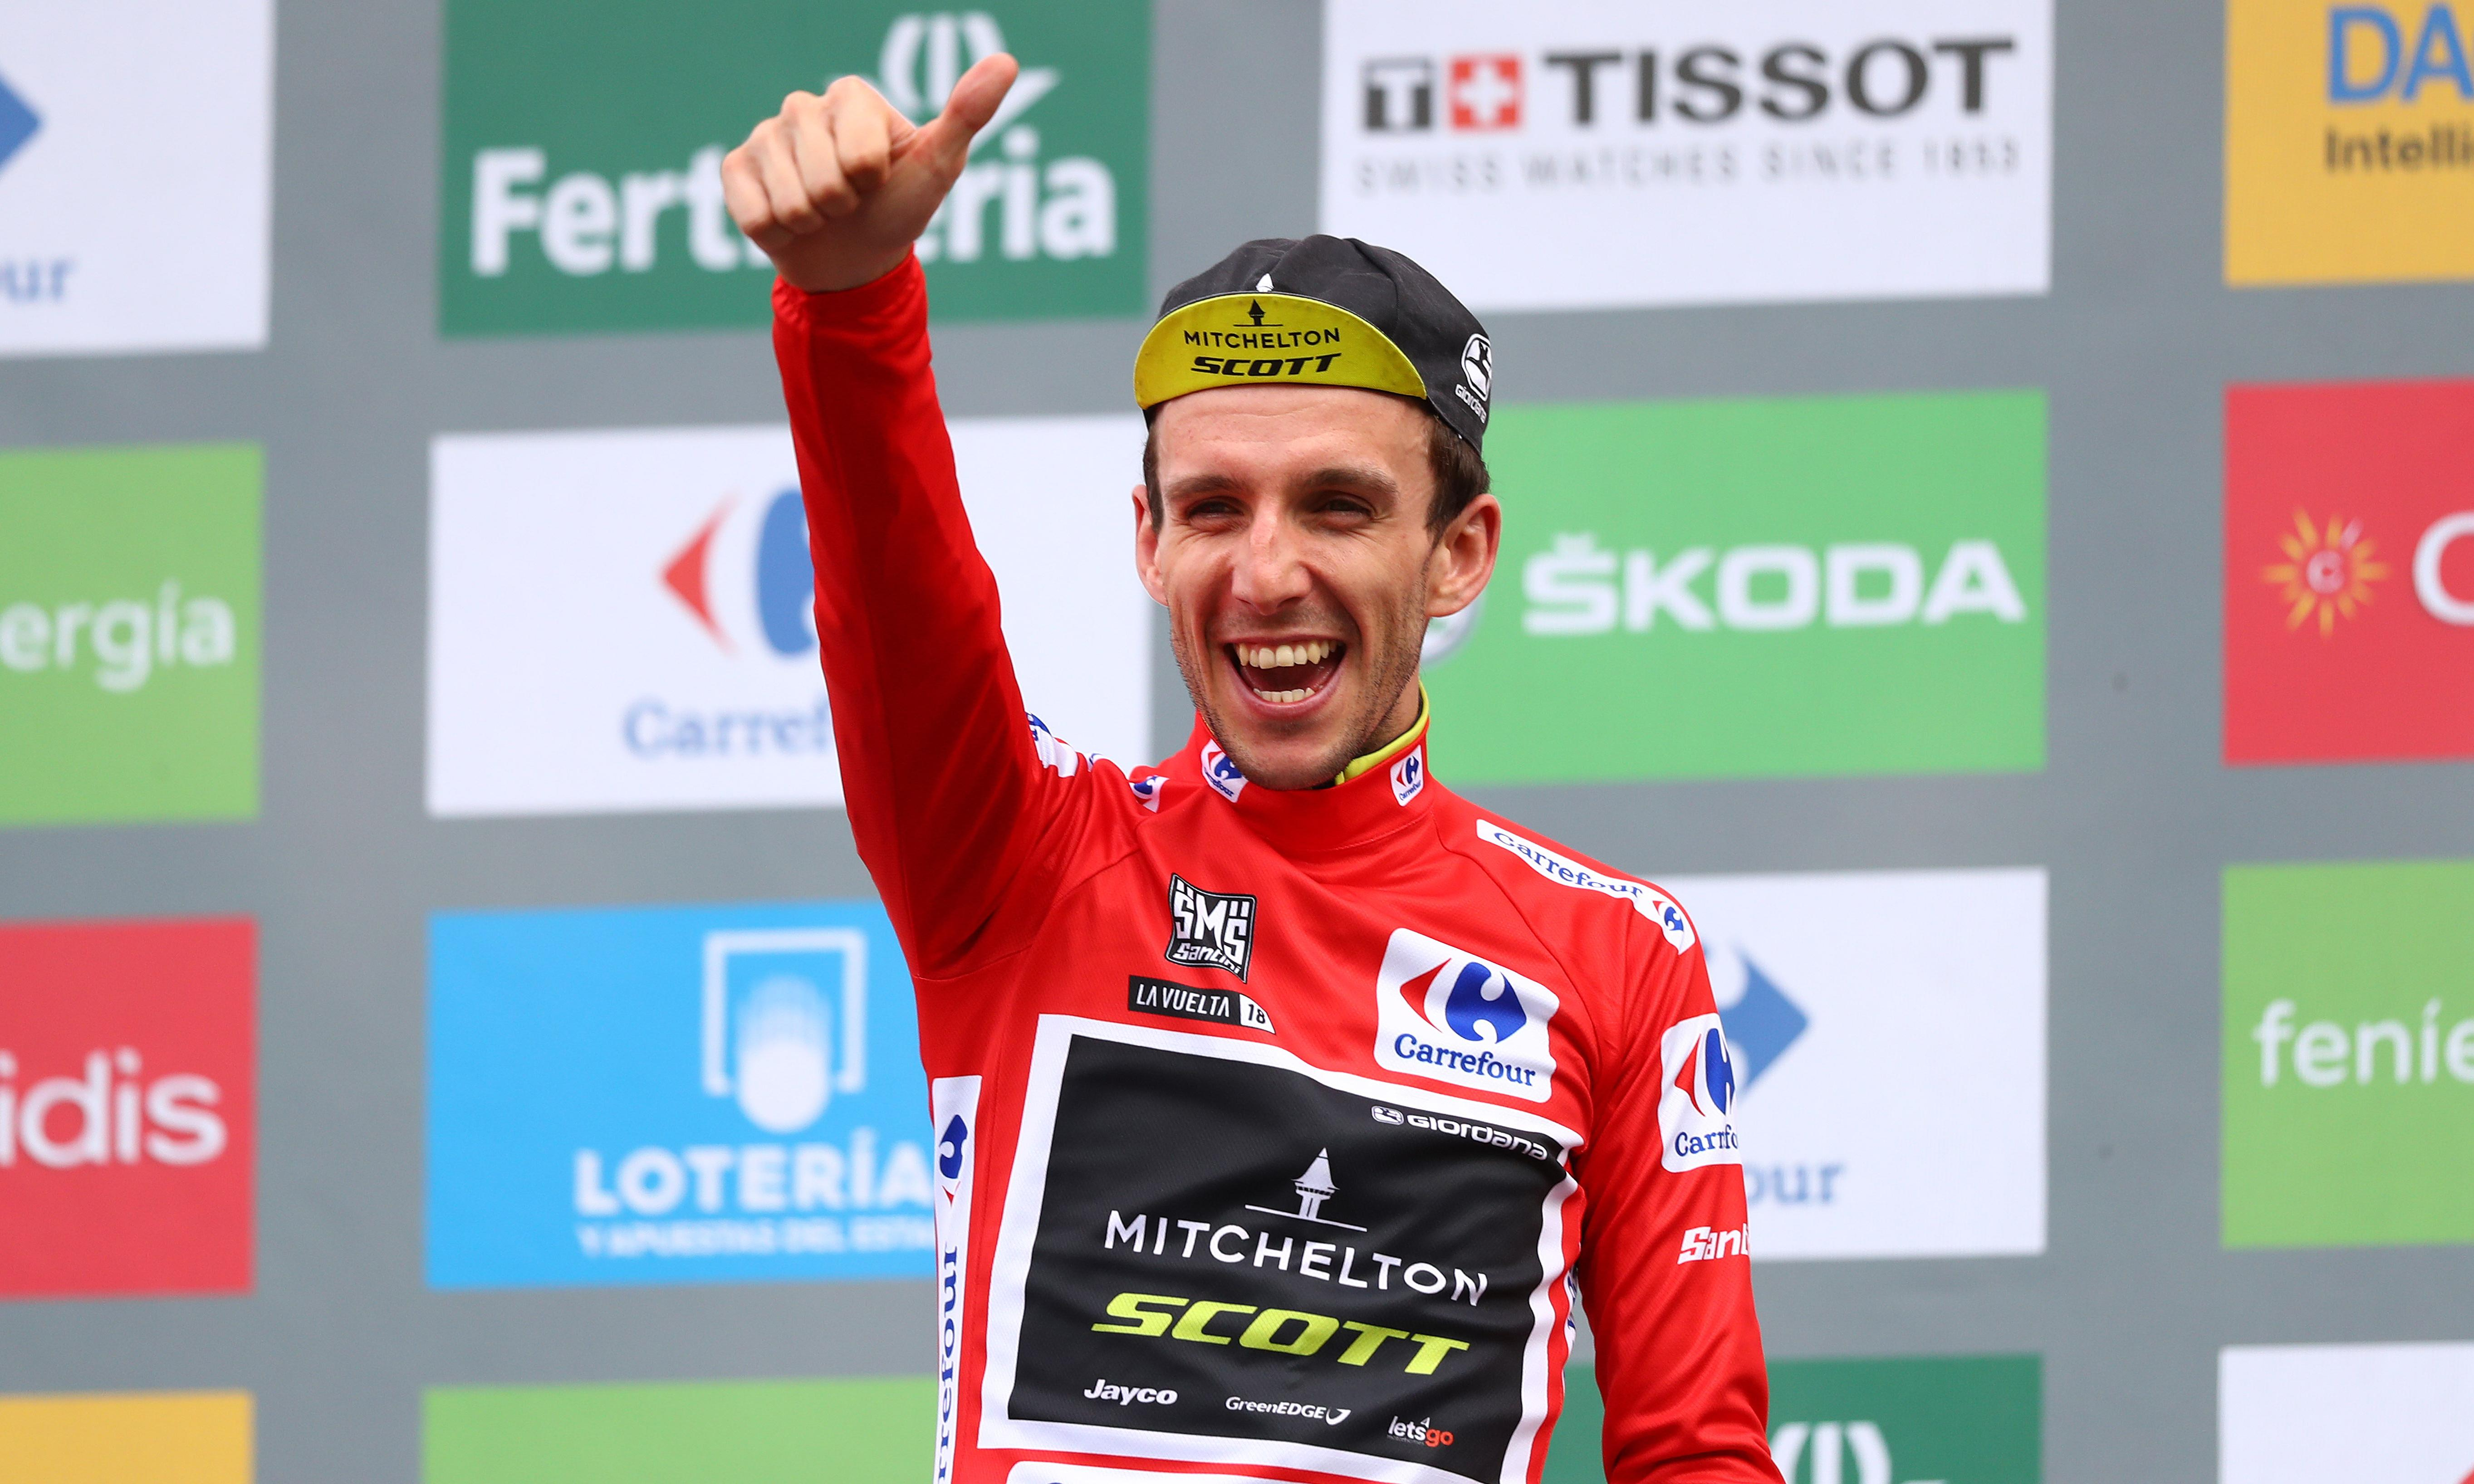 Simon Yates' Vuelta glory built on endless patience and iron discipline